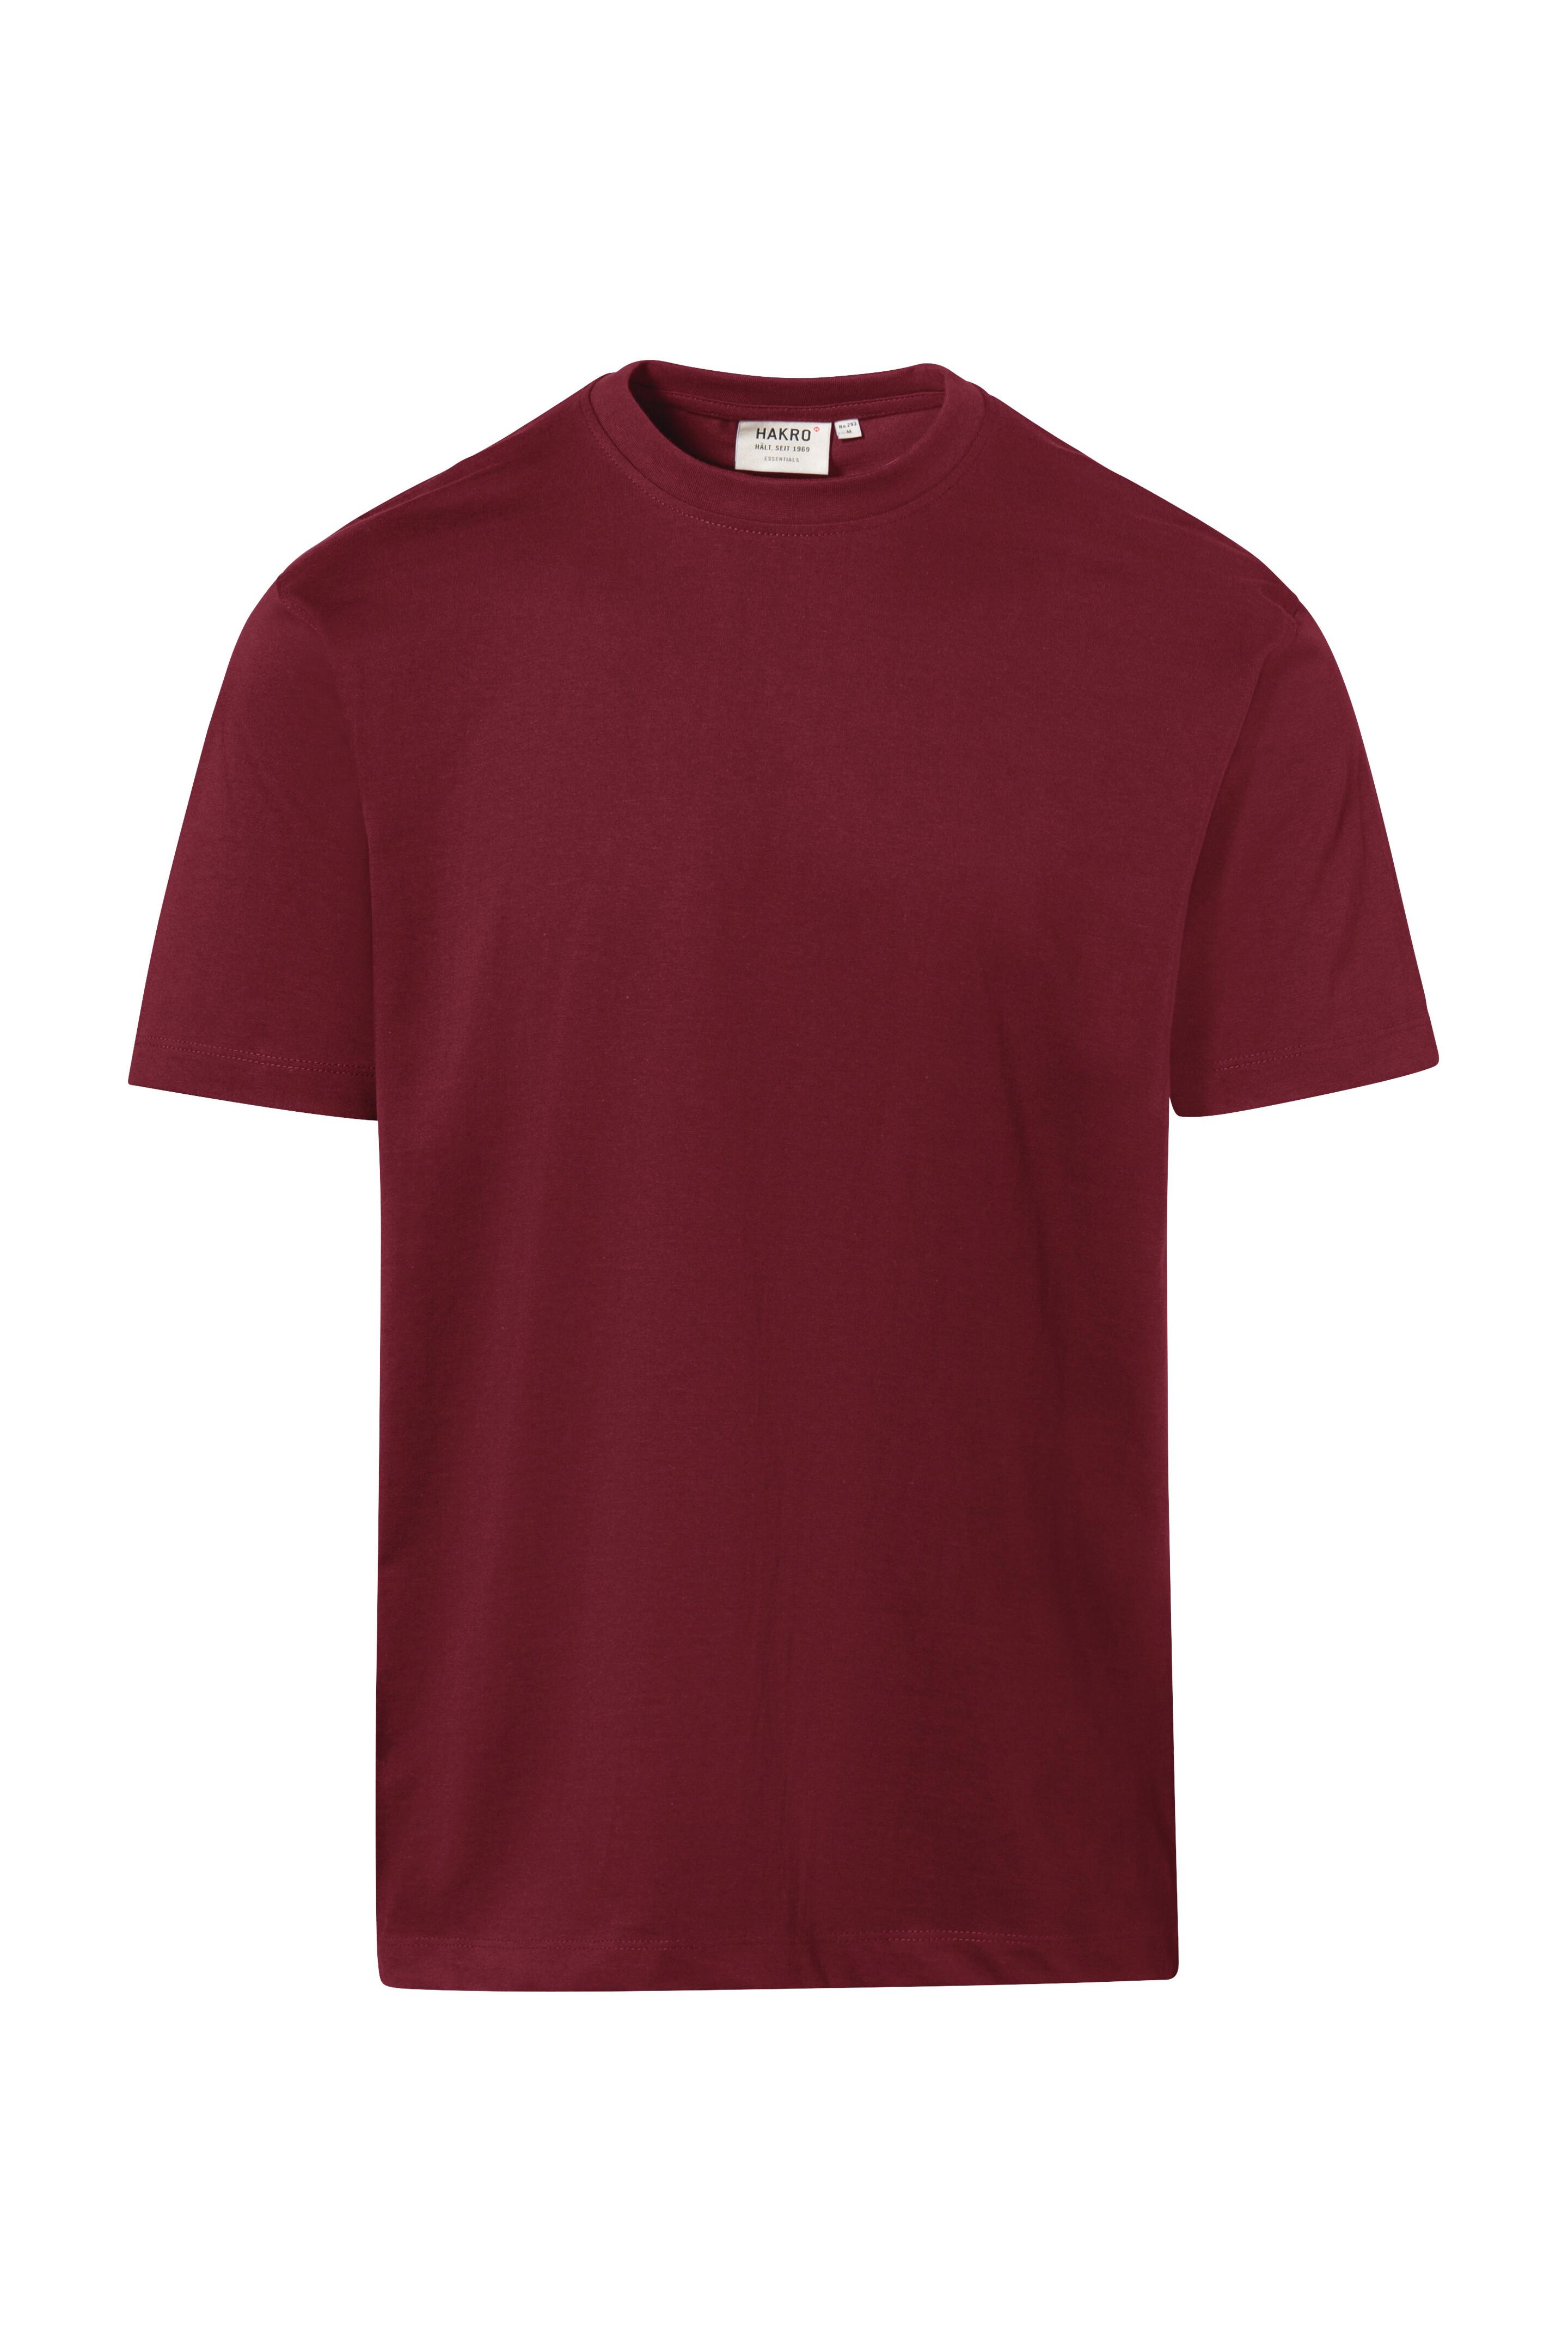 T-Shirt Heavy Cotton Hakro No. 293